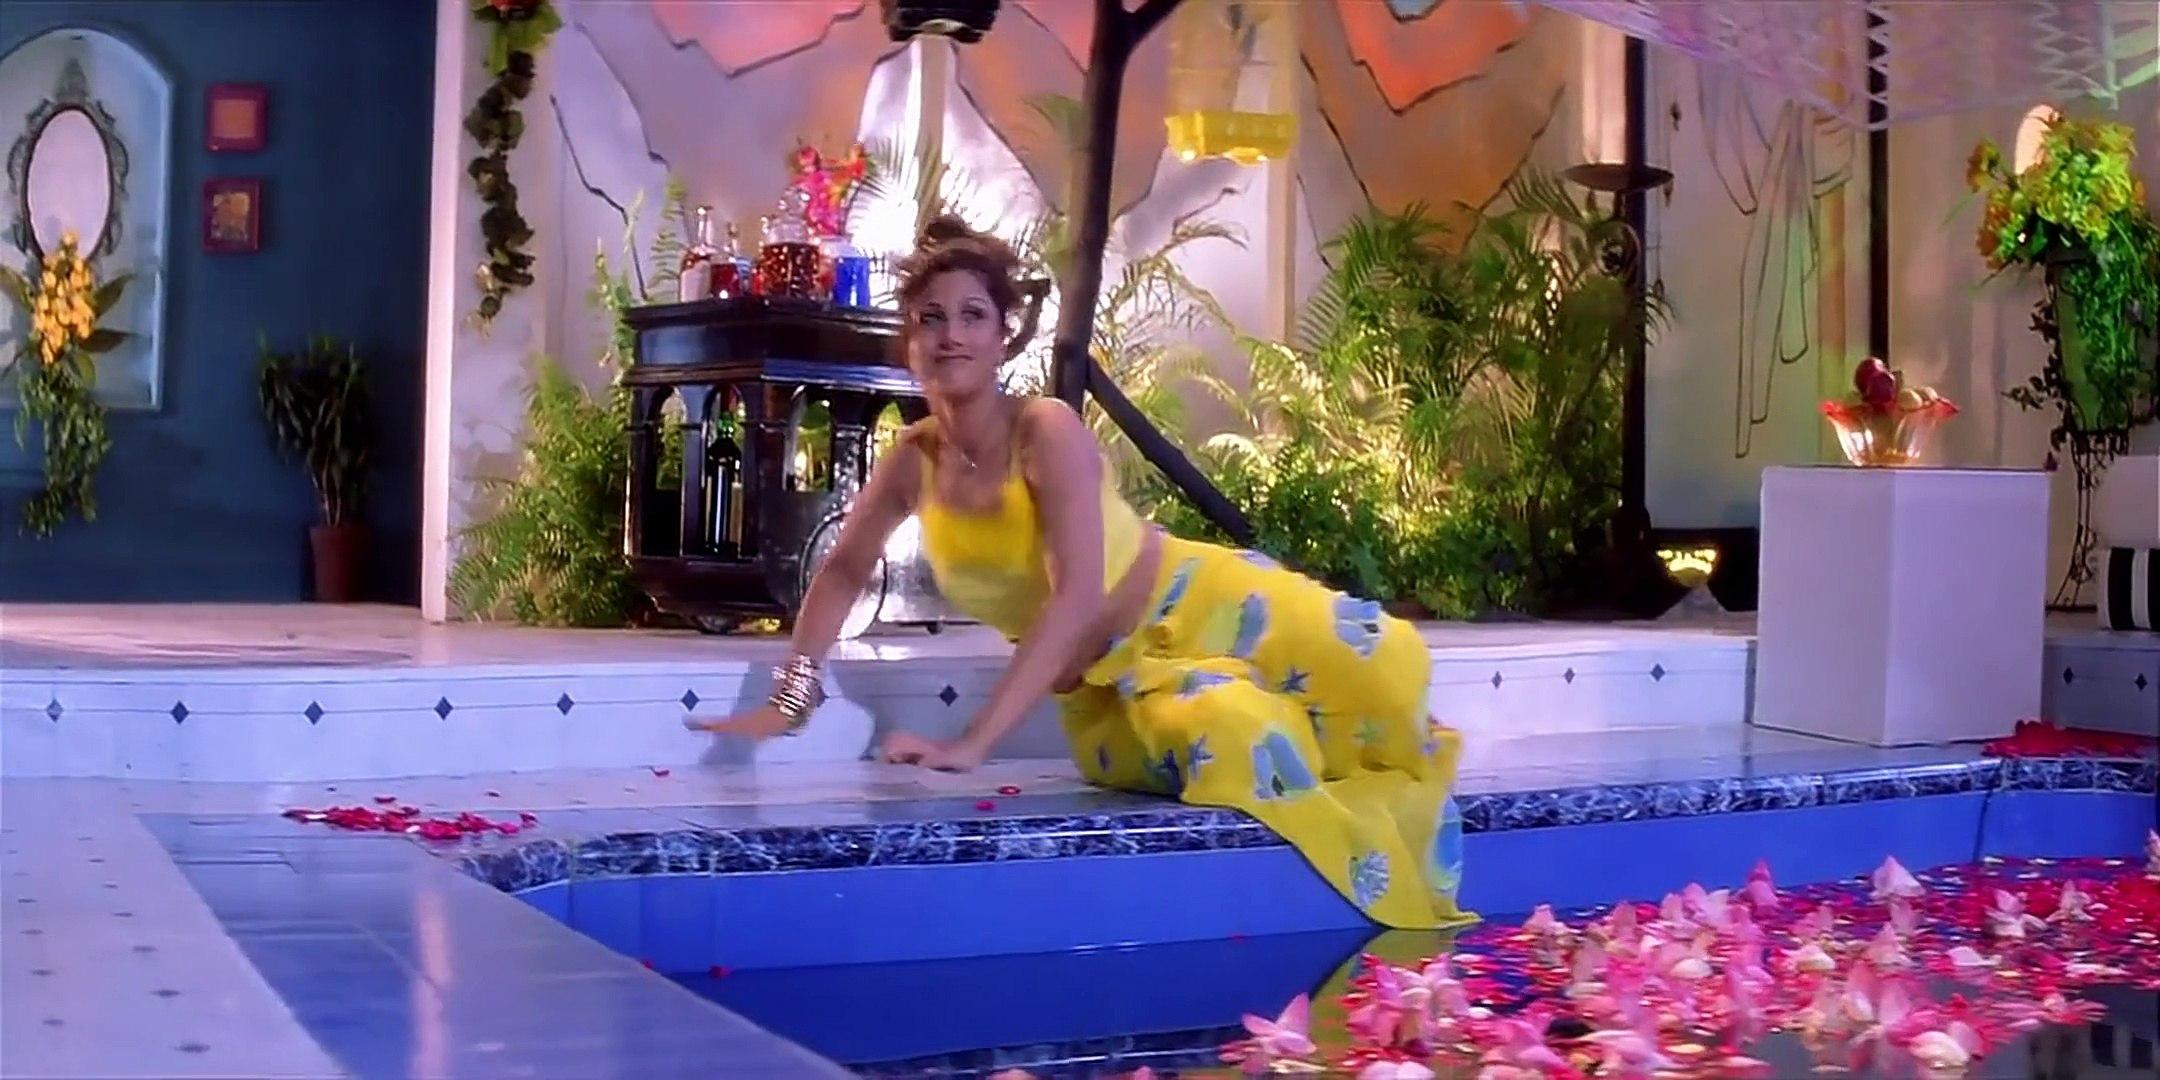 Udd Gayi Meri Nindiya Re - Kyo Kii Main Jhuth Nahin Bolta - Full HD Video  Song